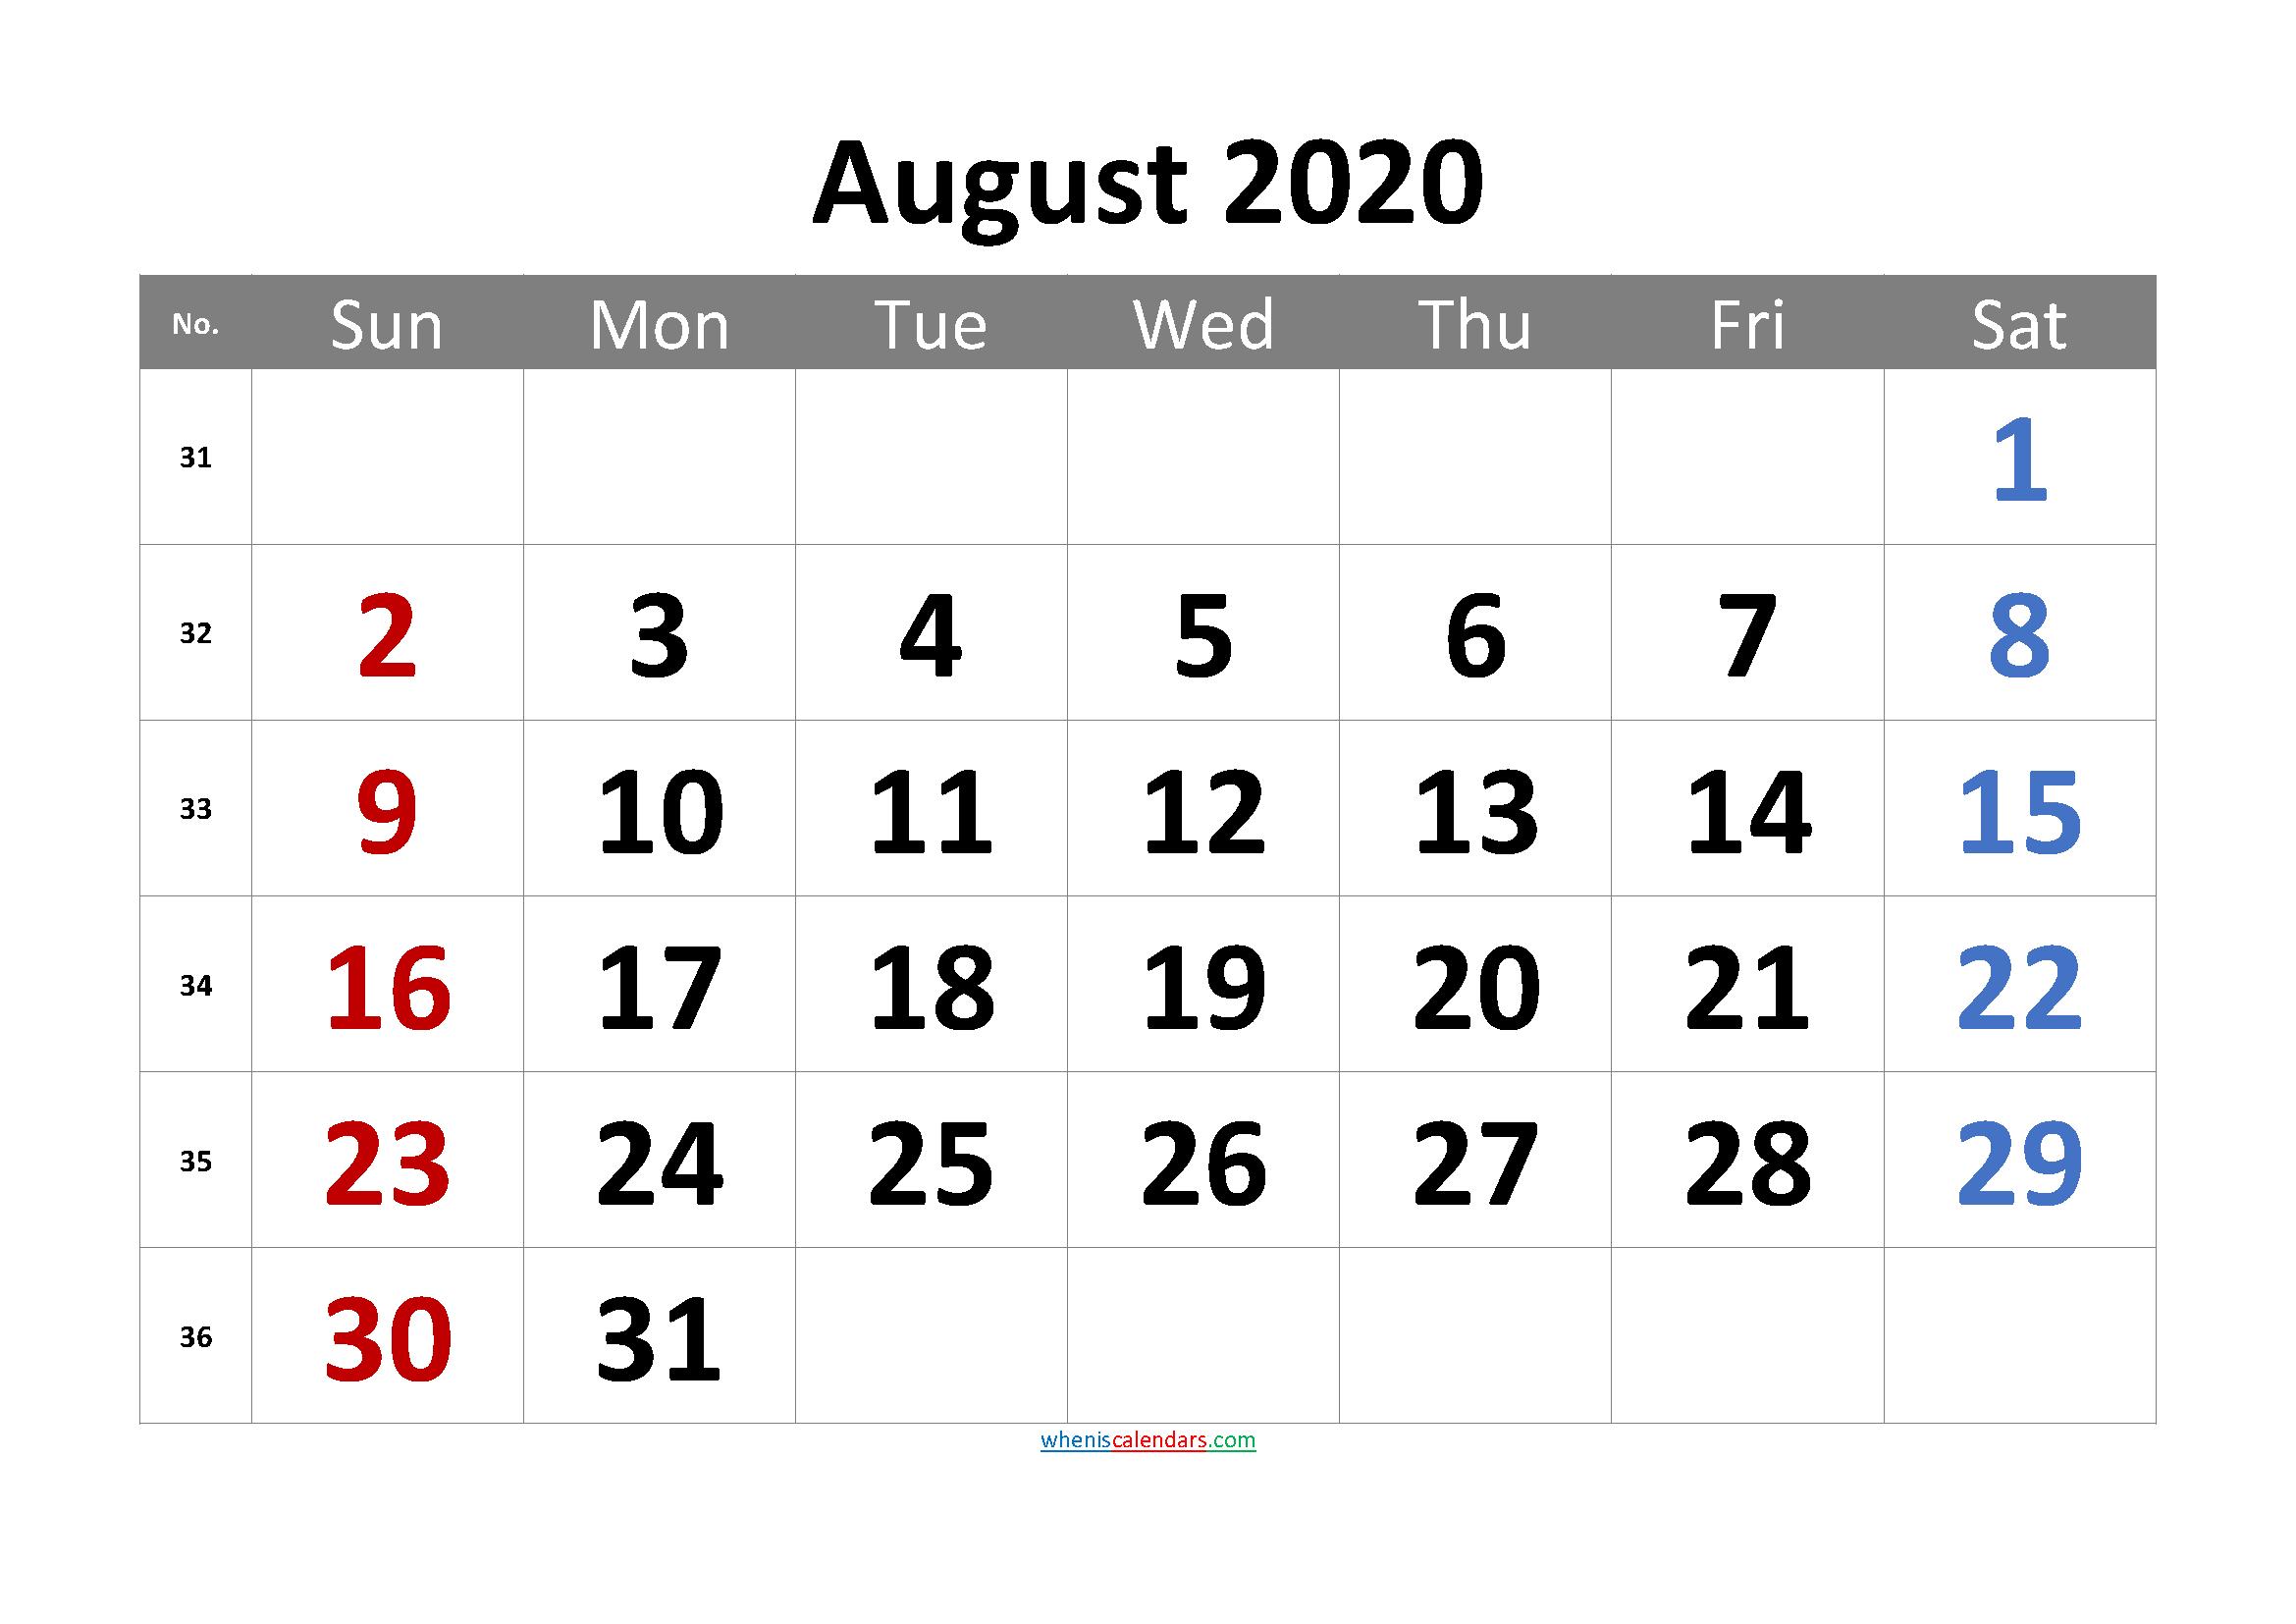 Free AUGUST 2020 Calendar Printable